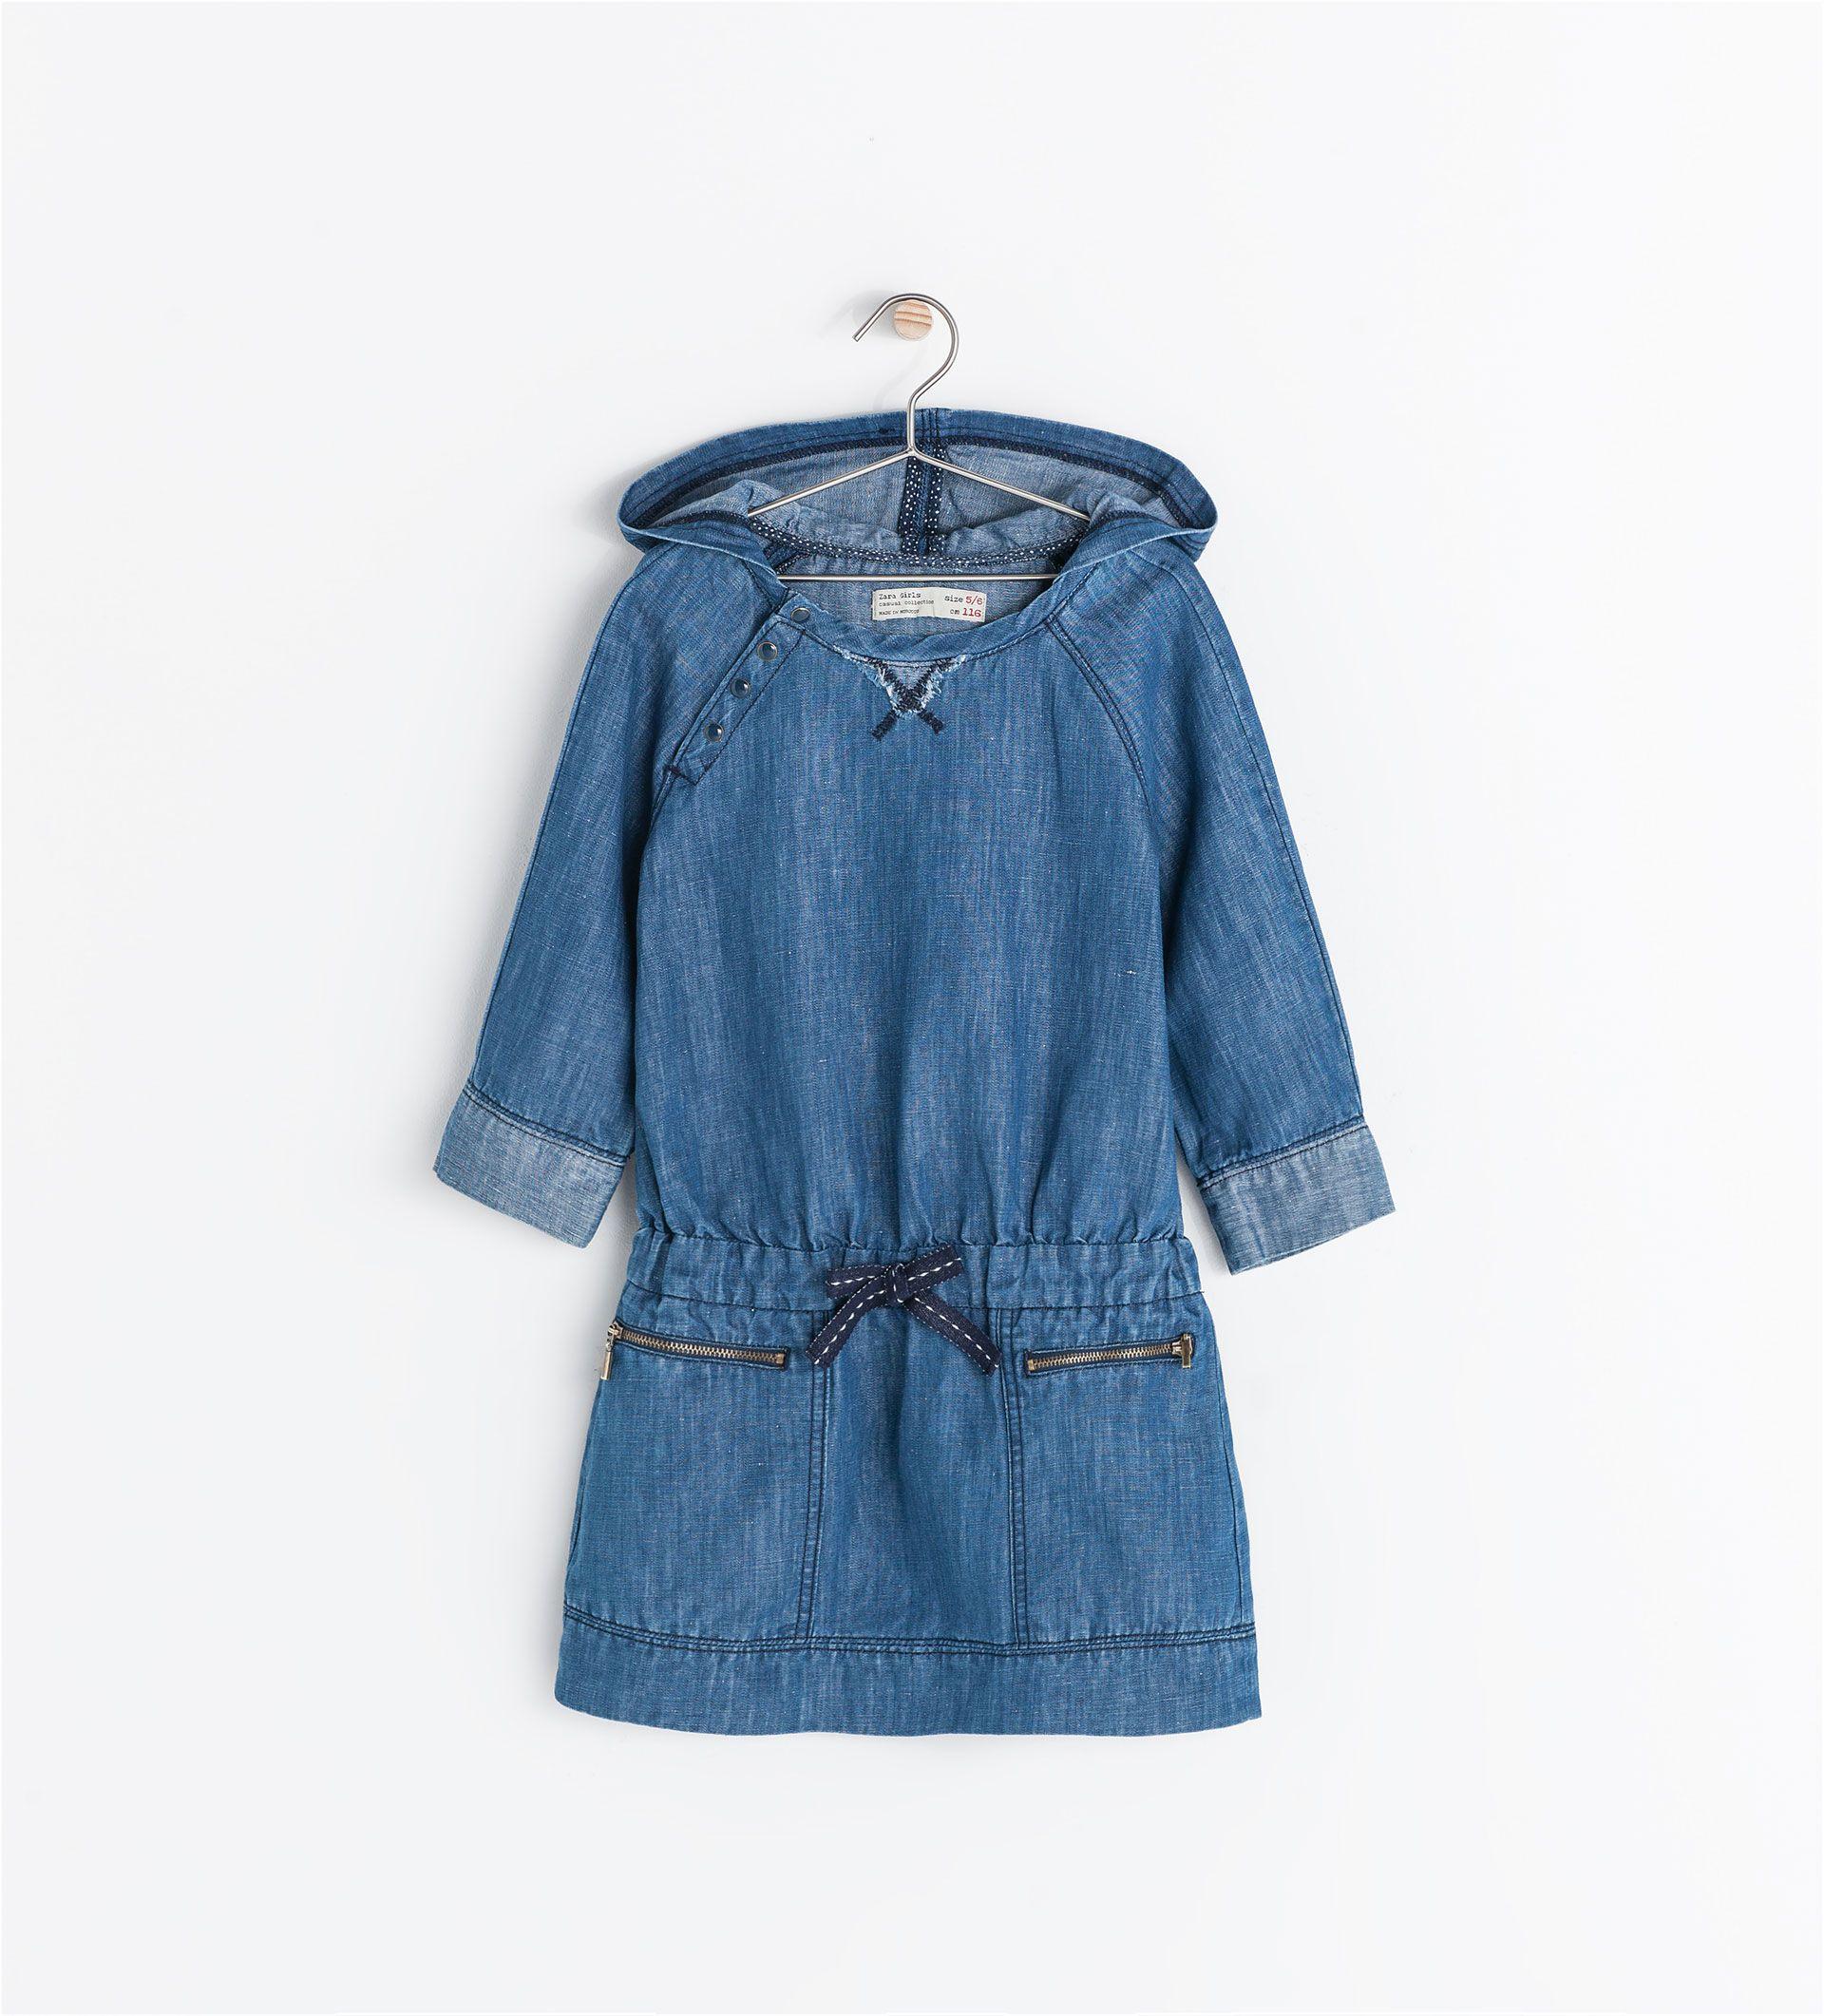 HOODED DRESS - Dresses - Girl (3 - 14 years) - KIDS | ZARA United States